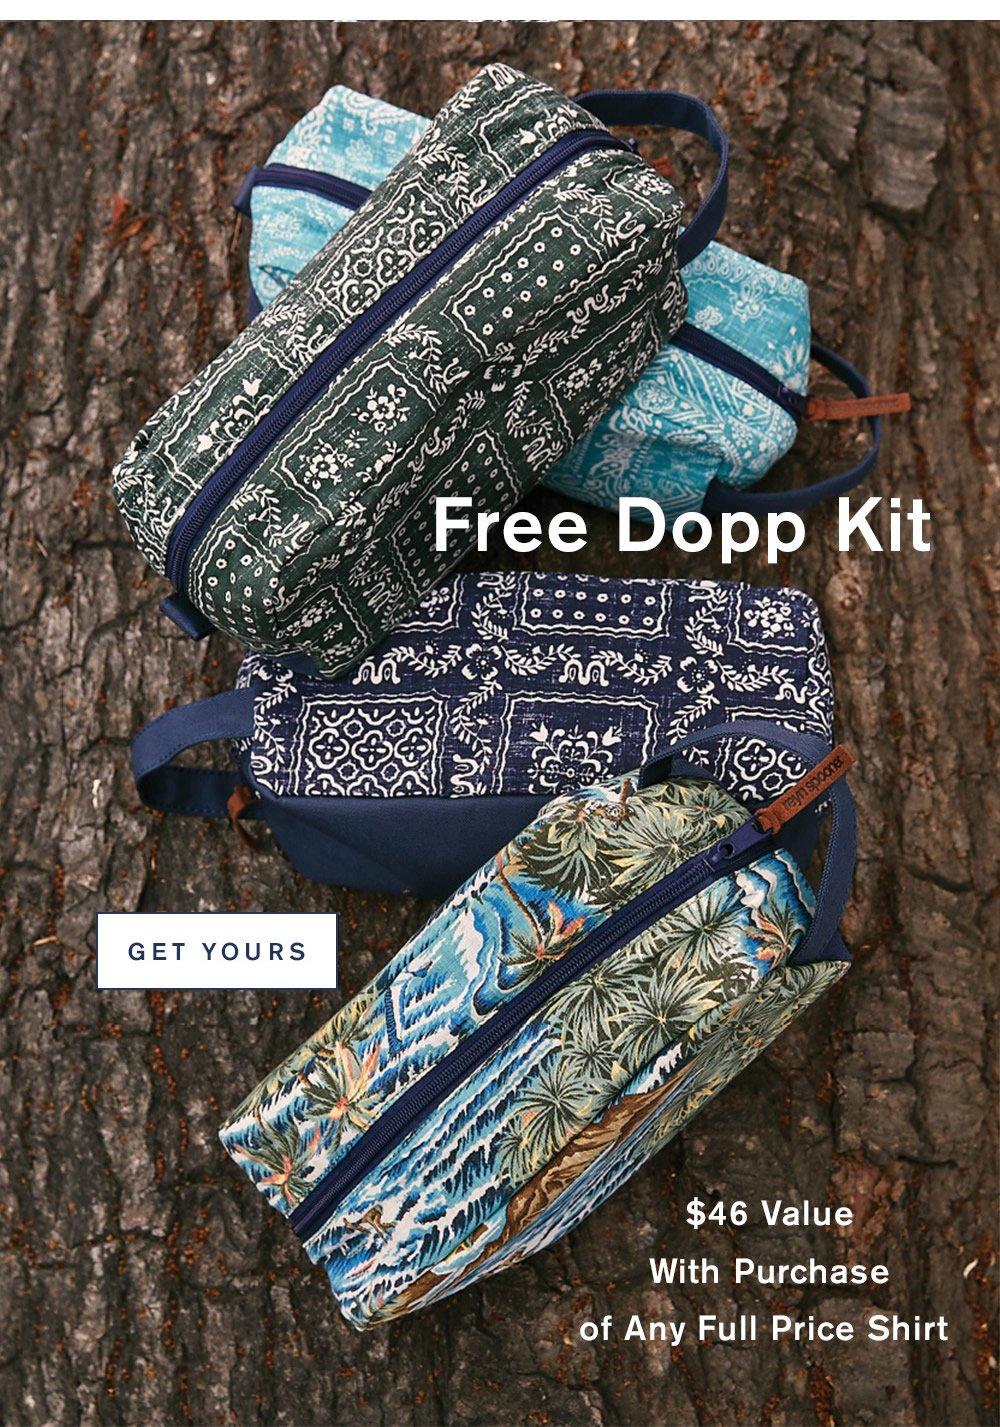 Free Dopp Kit. Get Yours